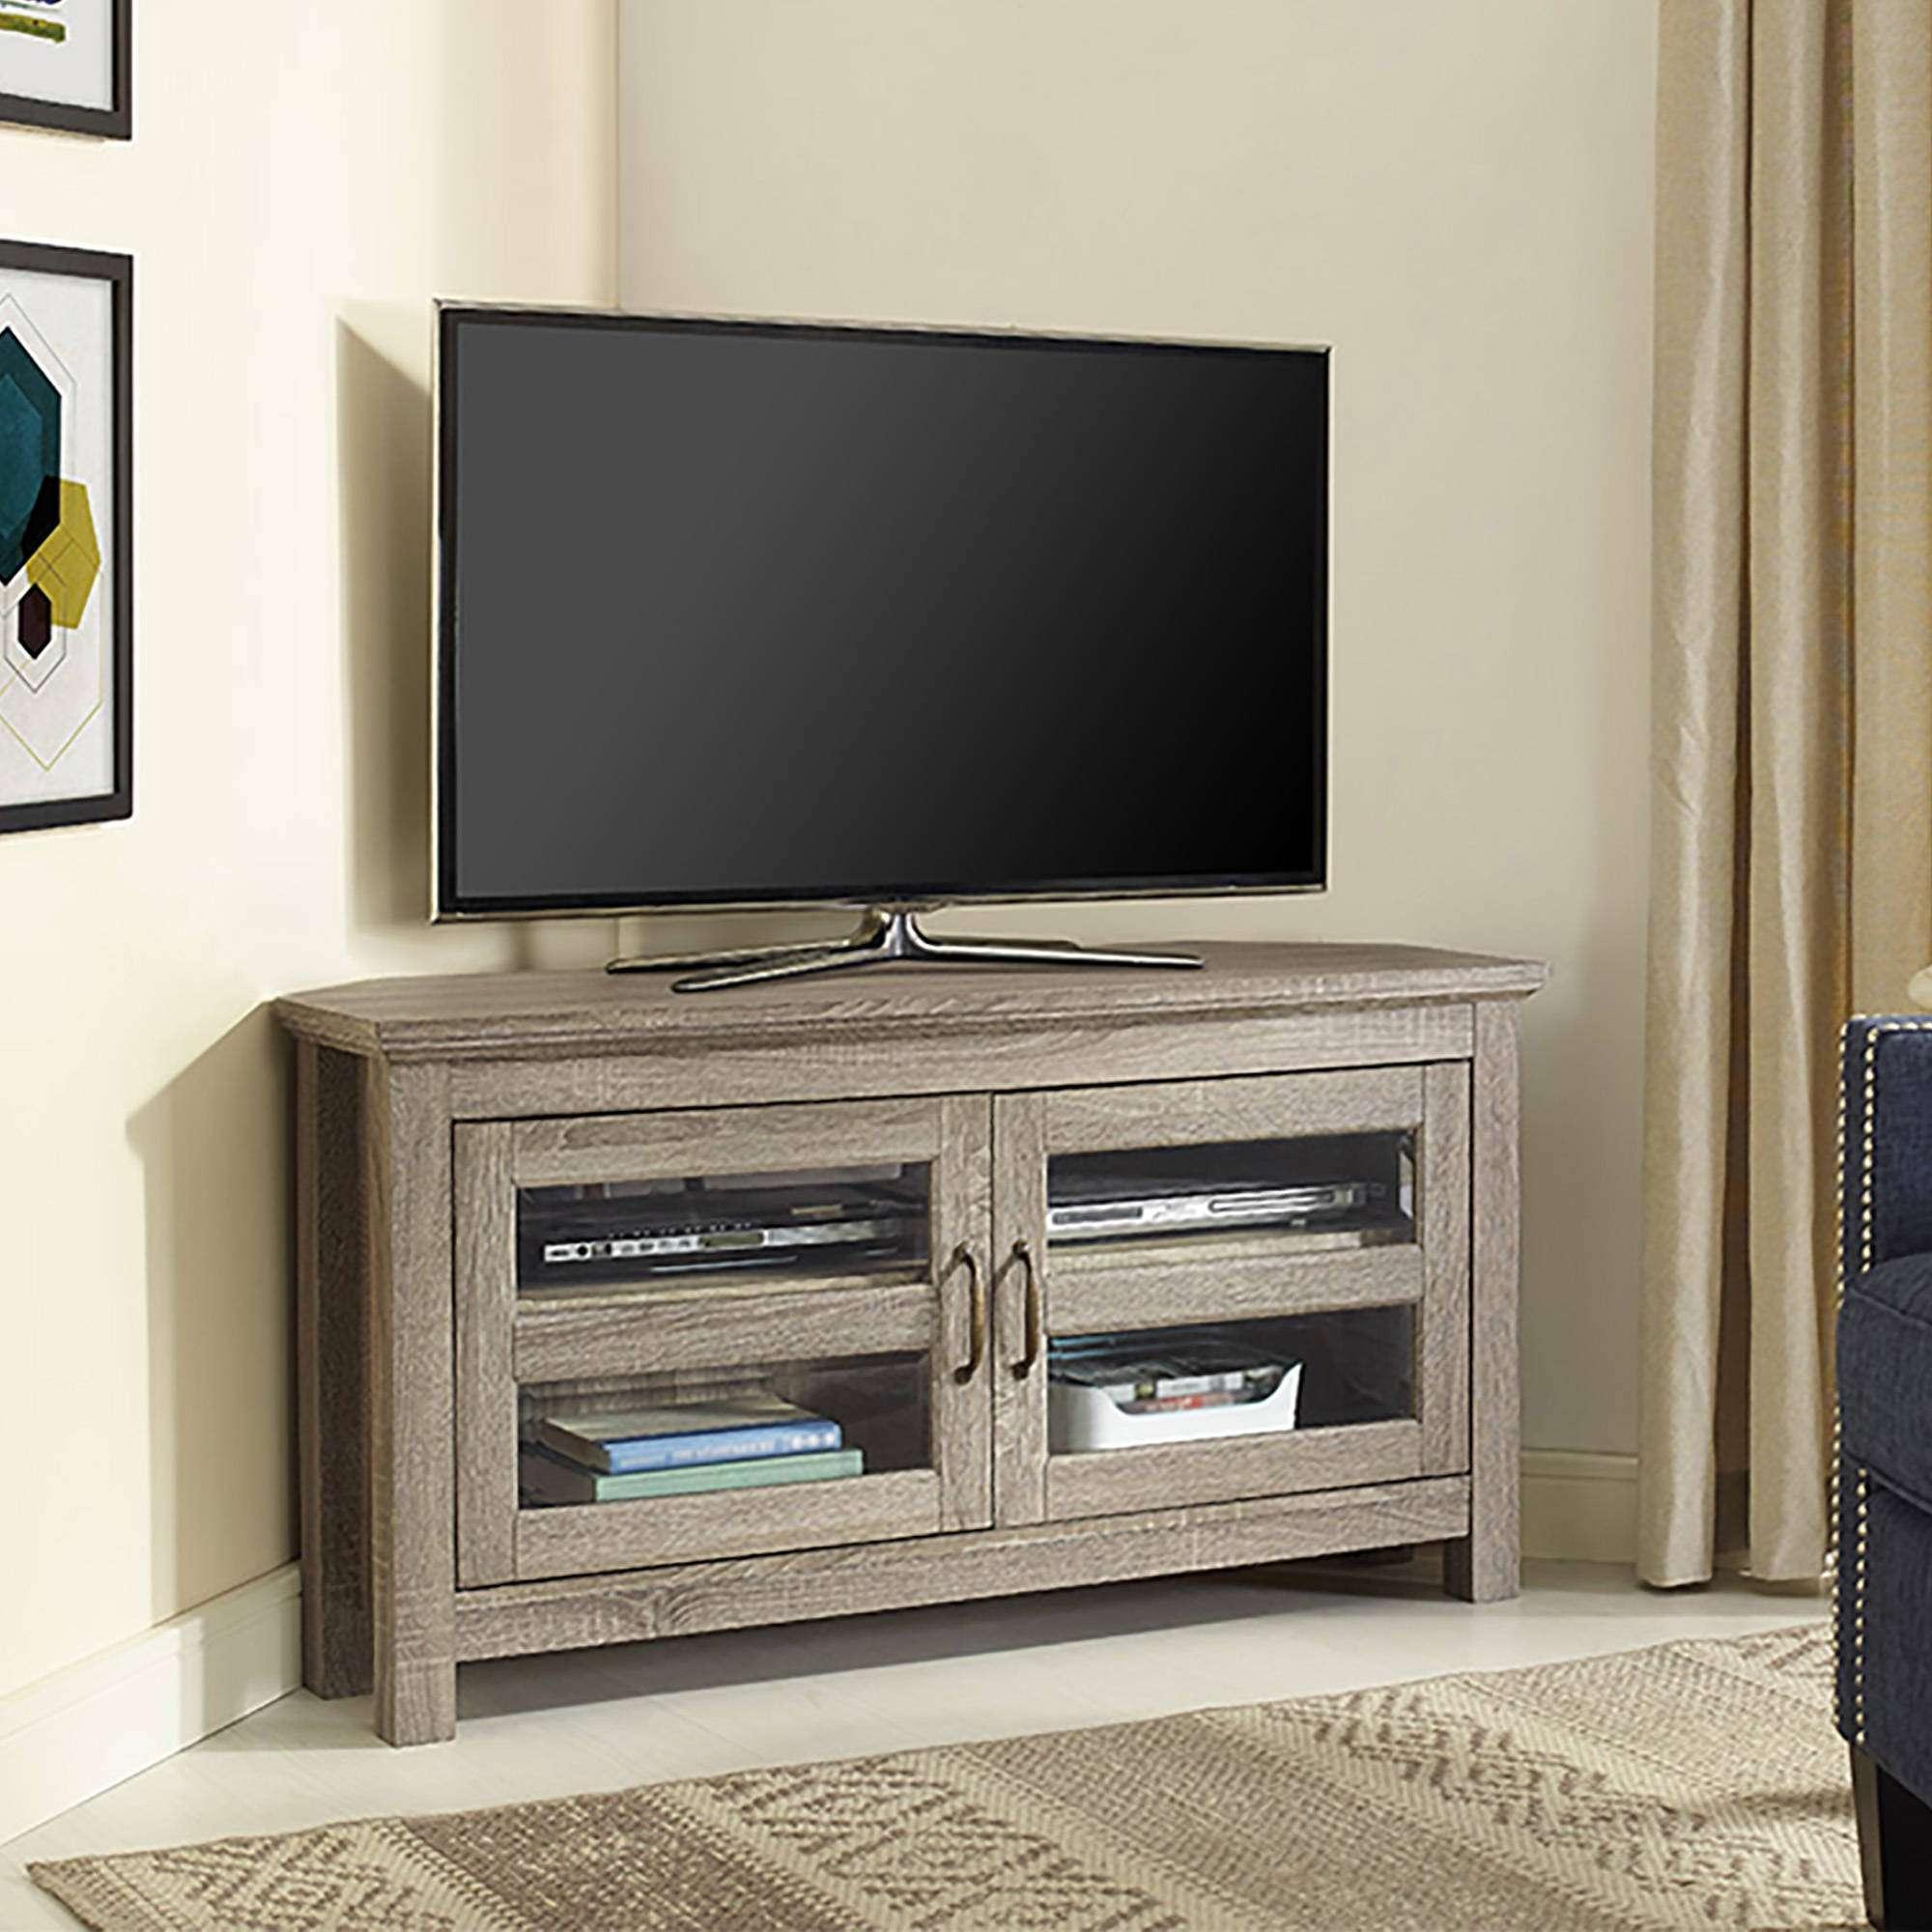 Fancy Walker Edison Corner Tv Stand 64 On Home Designing Regarding Corner Tv Stands (View 15 of 15)